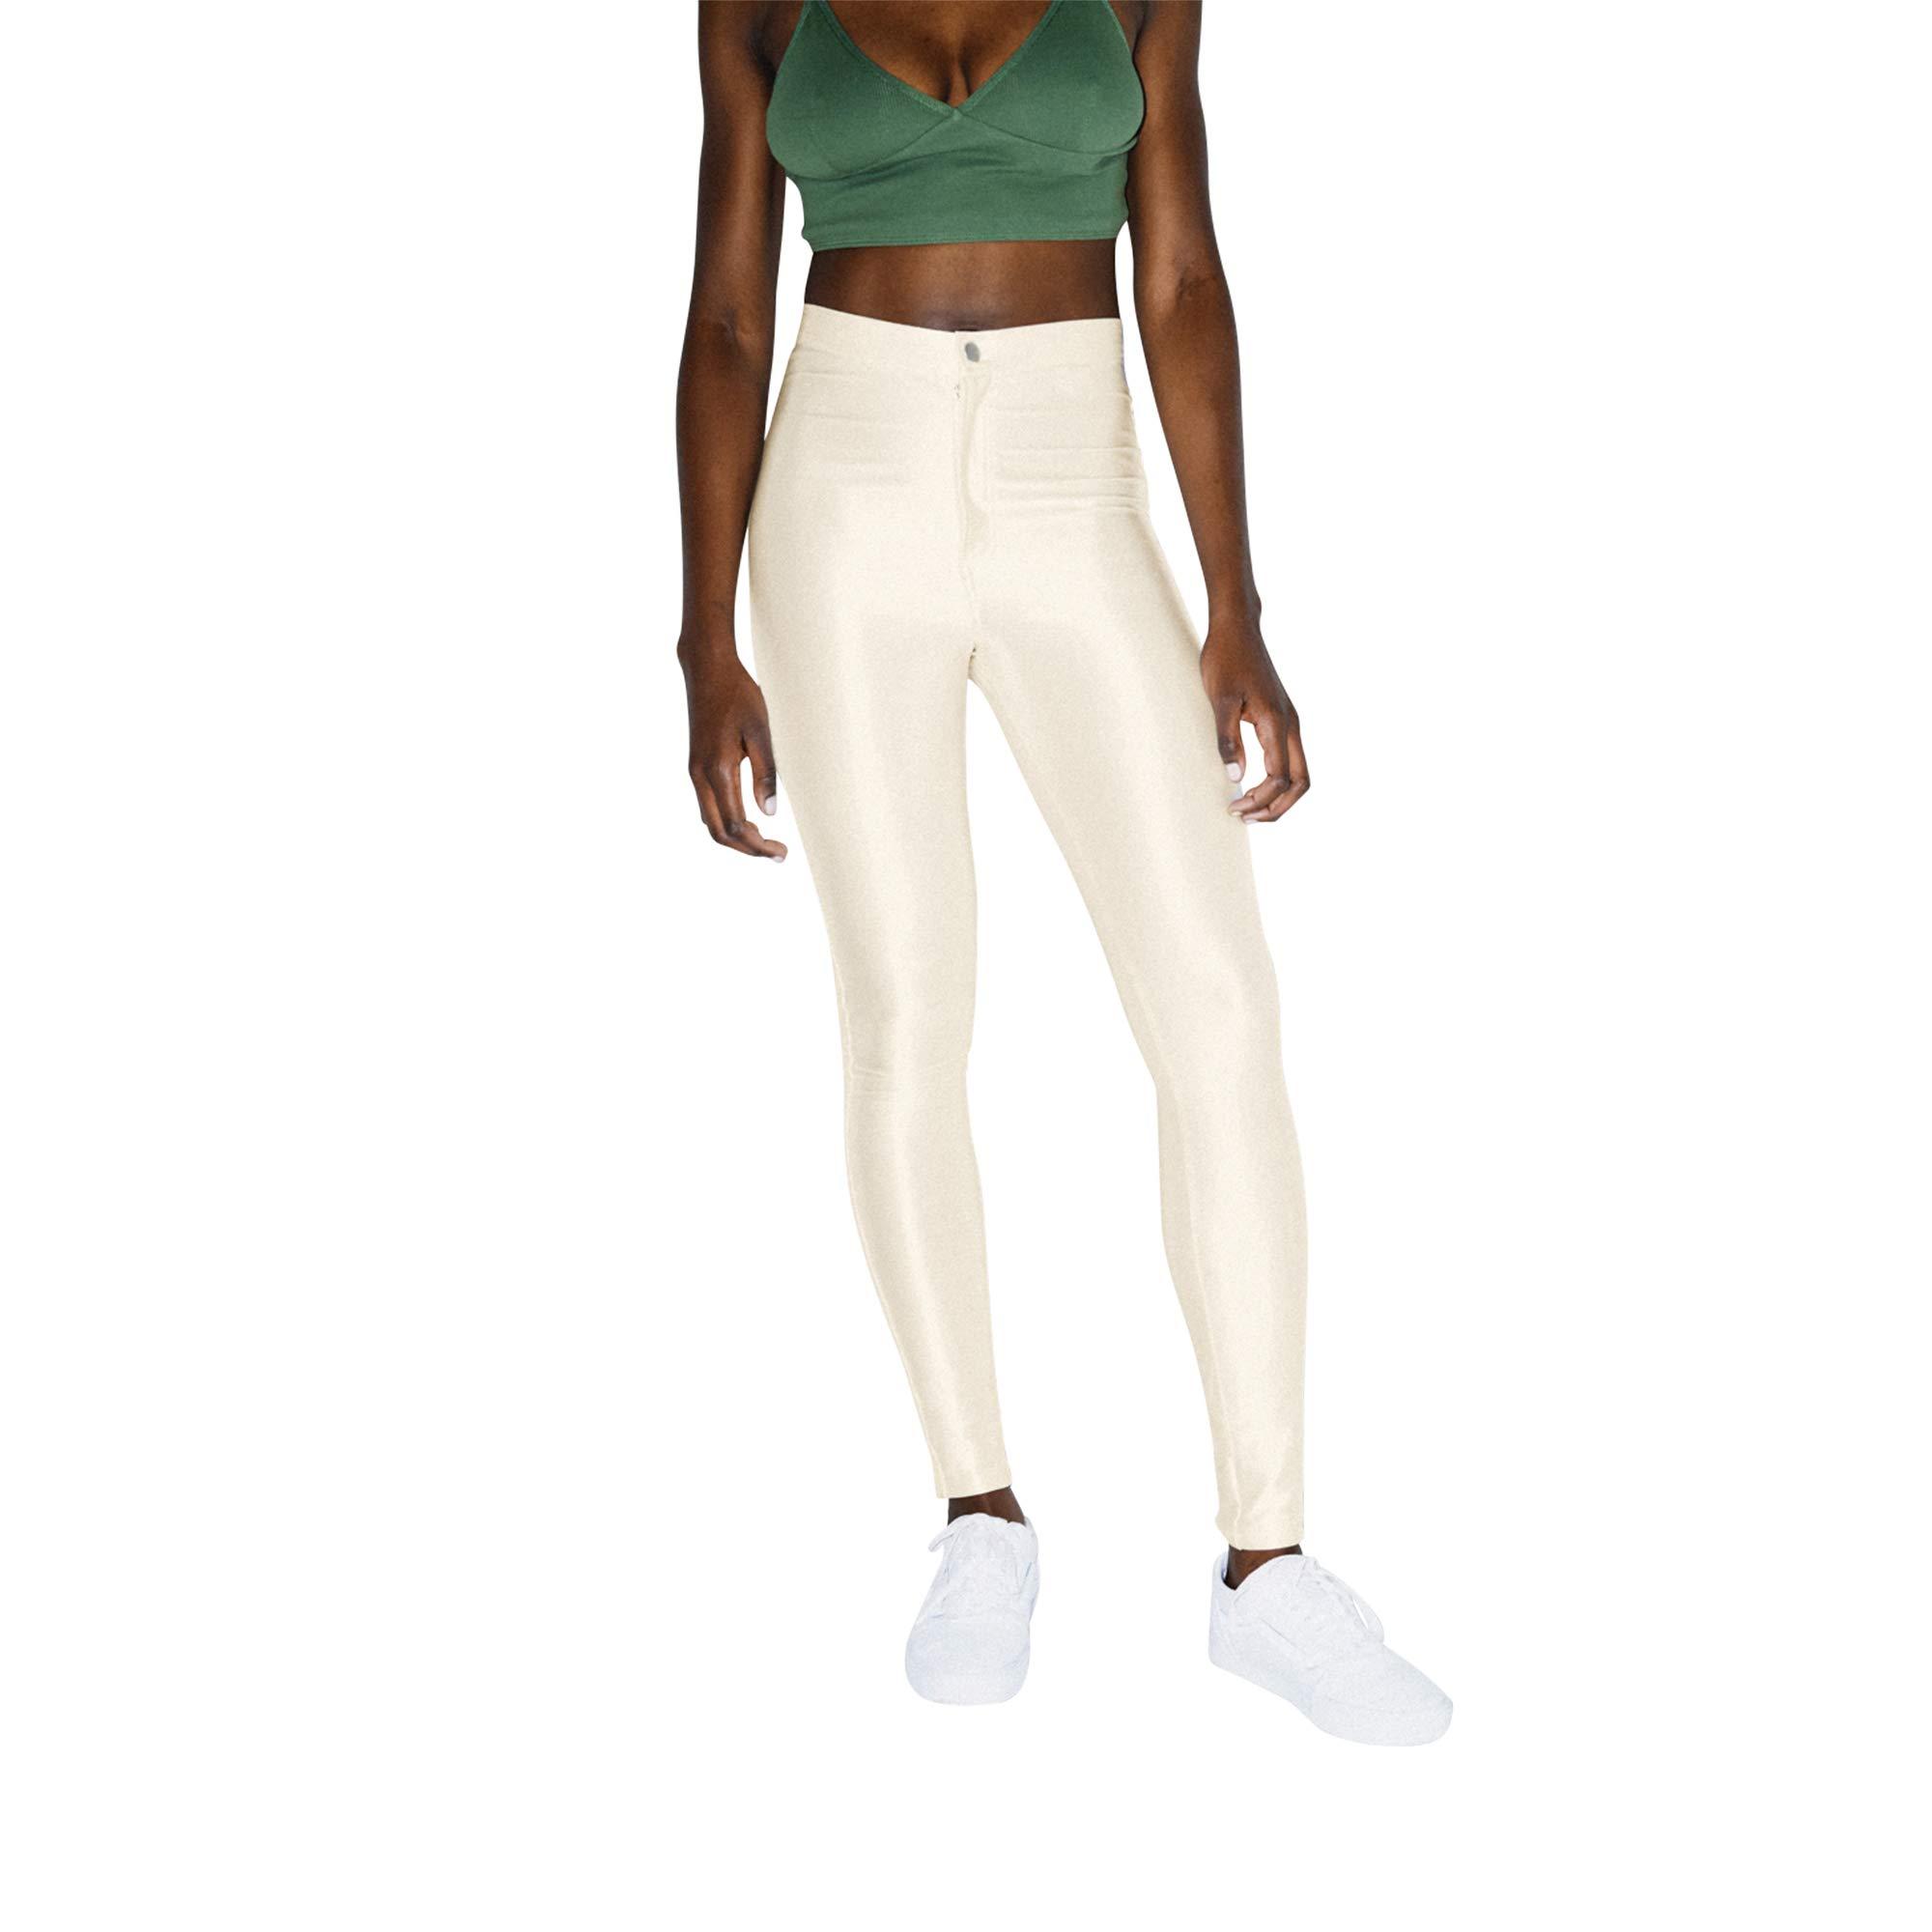 American Apparel Women's The-Disco Pant